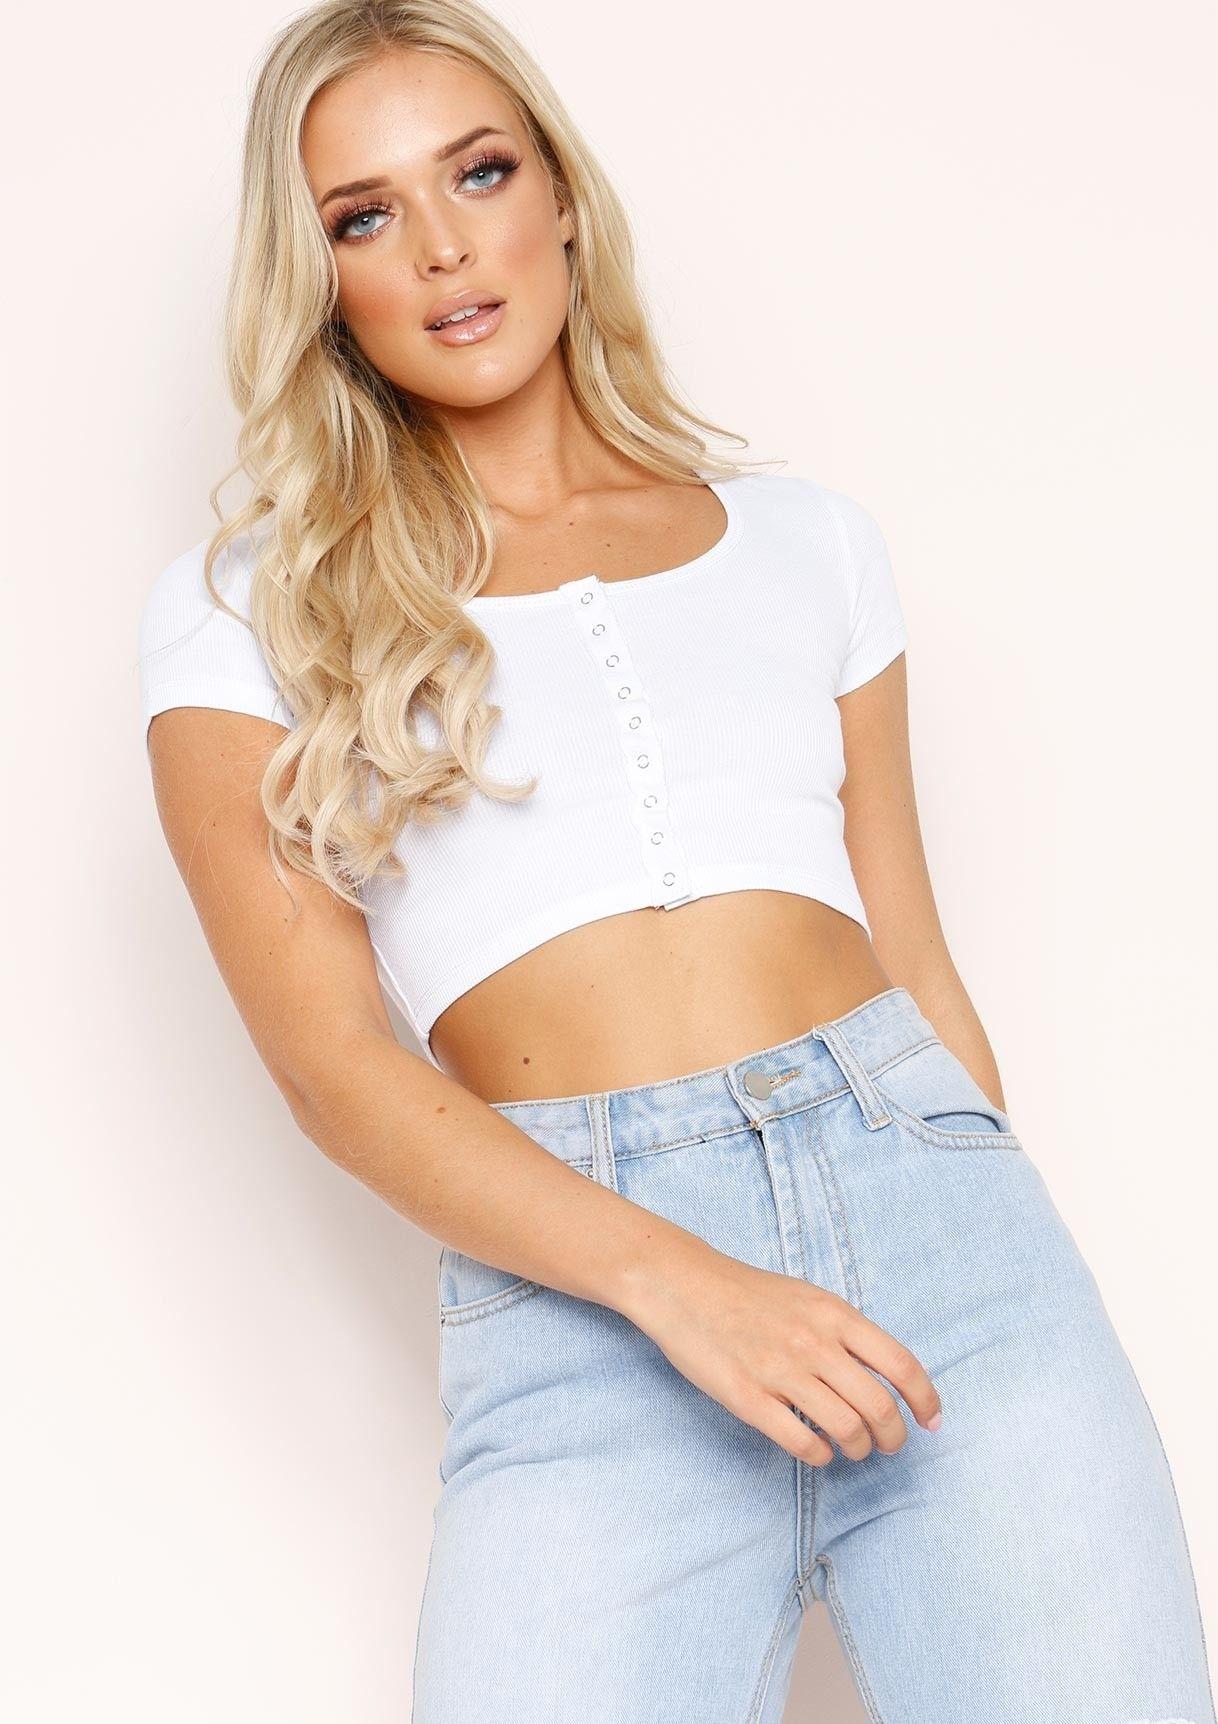 337ab1883e2a3 Missyempire - Livia White Button Crop Top